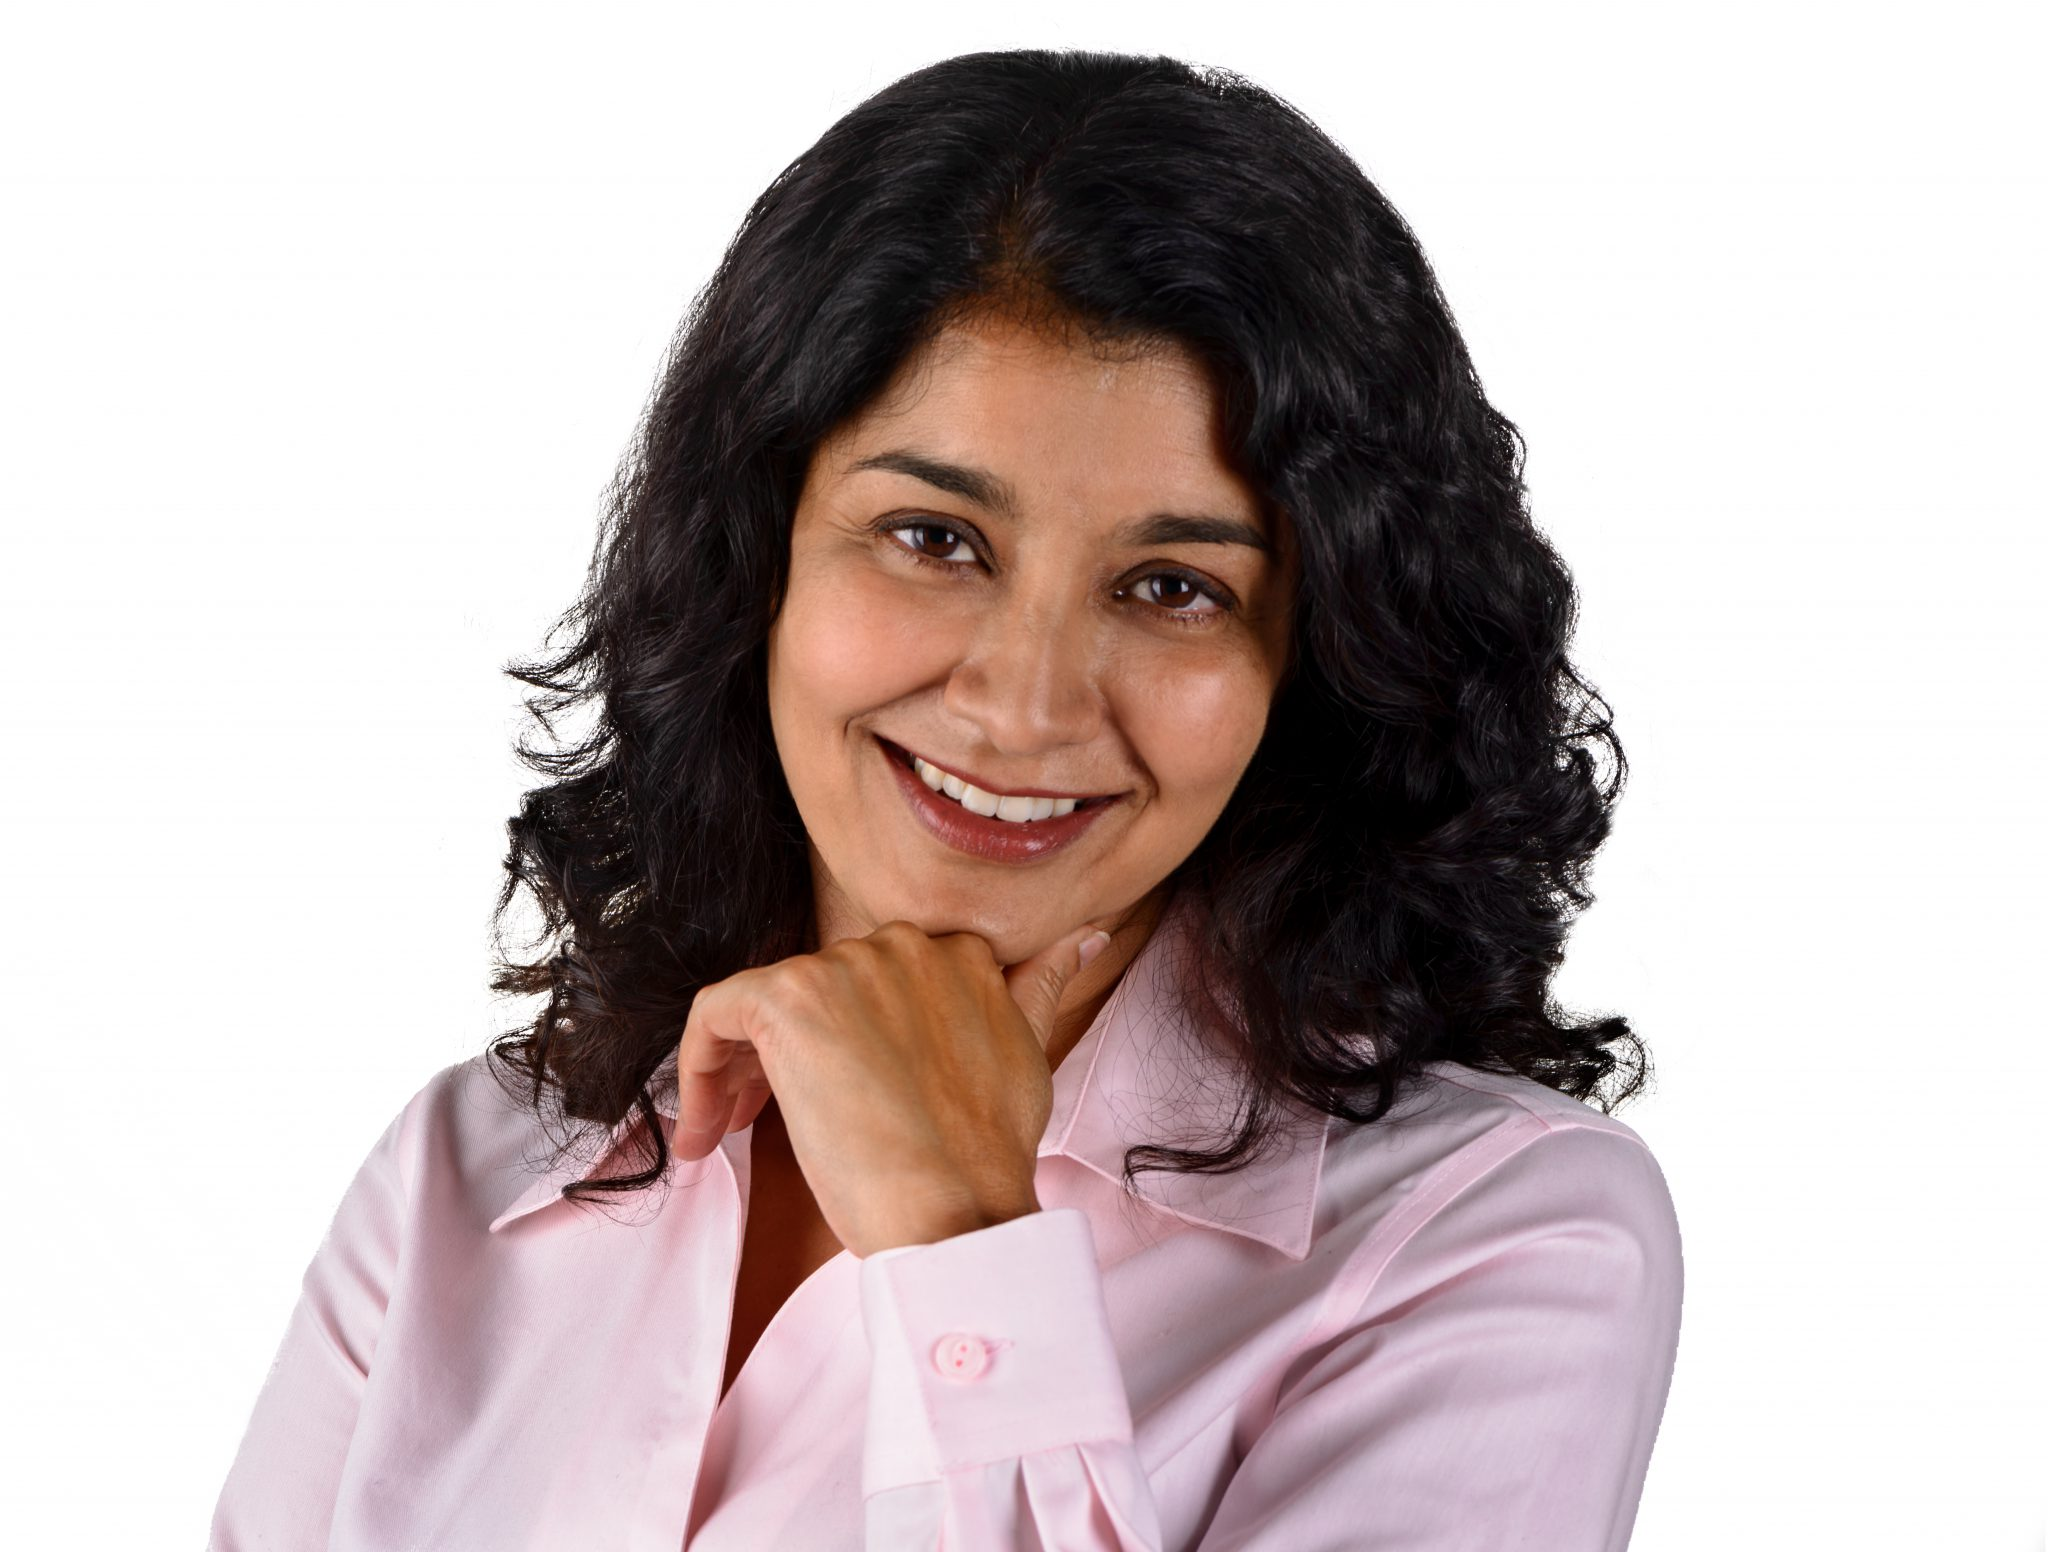 Priya Ramsingh